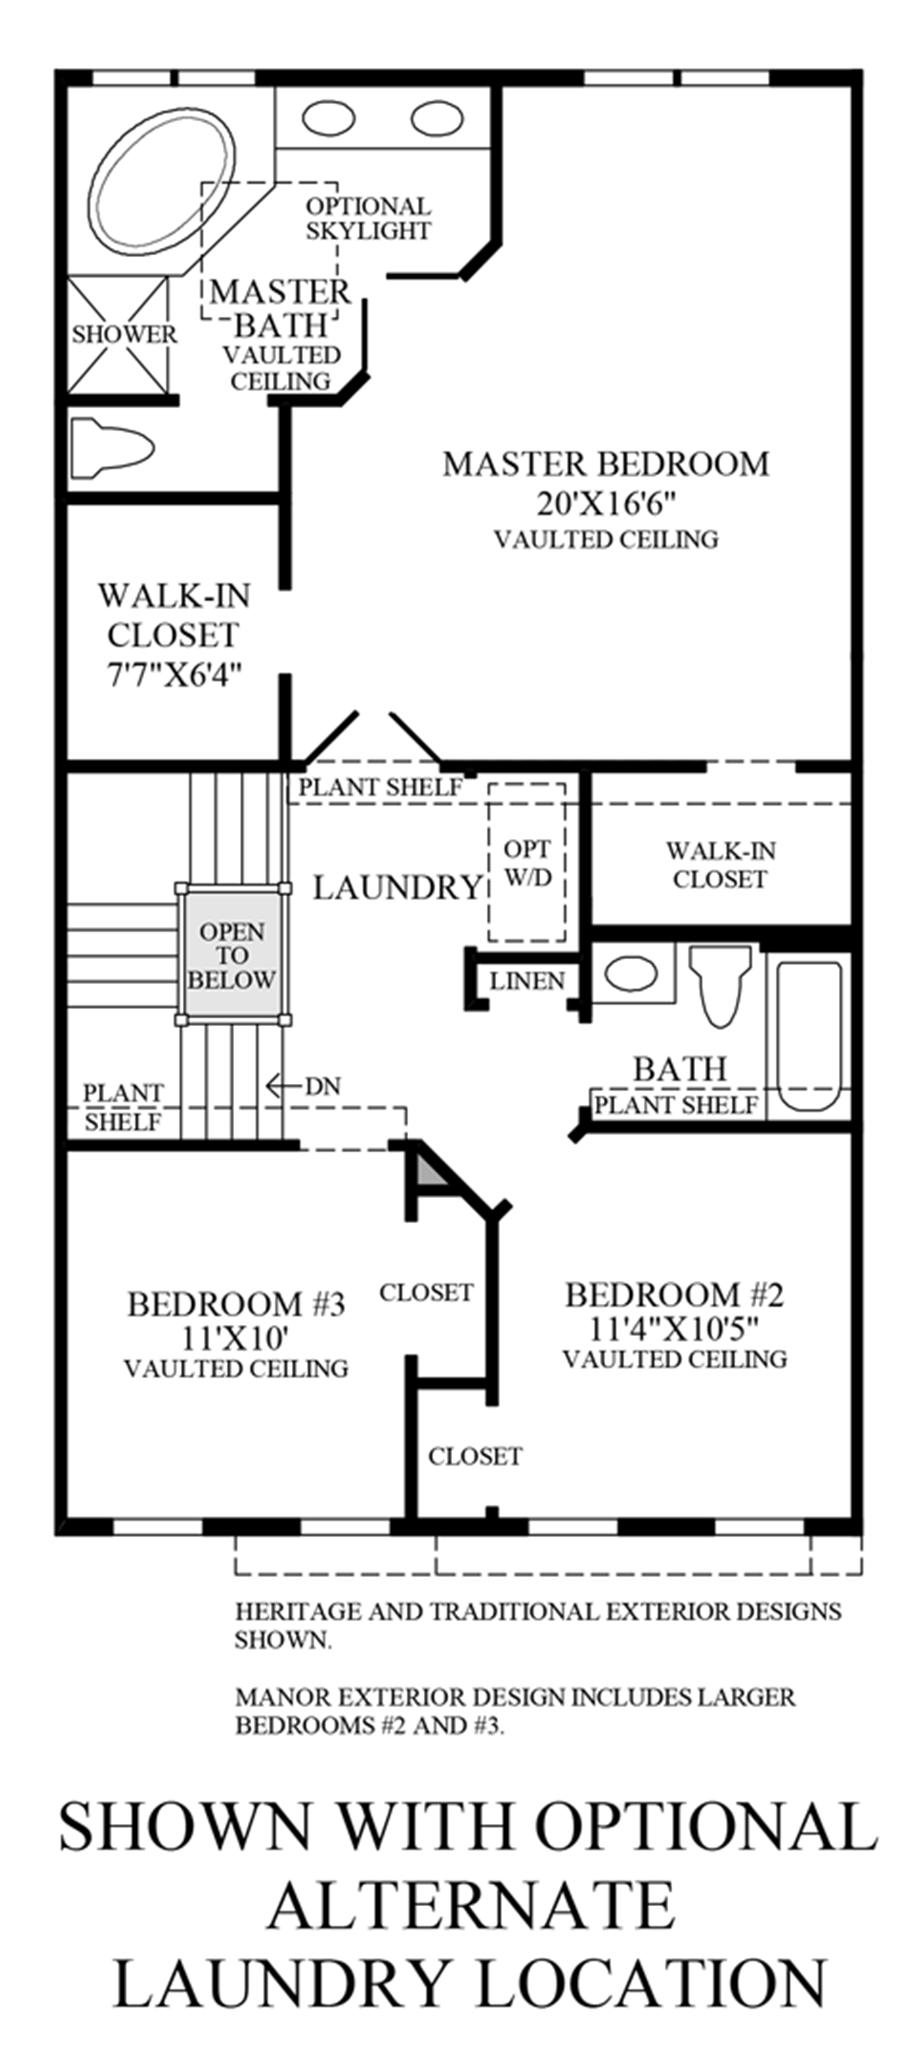 Optional Alternate Laundry Location Floor Plan